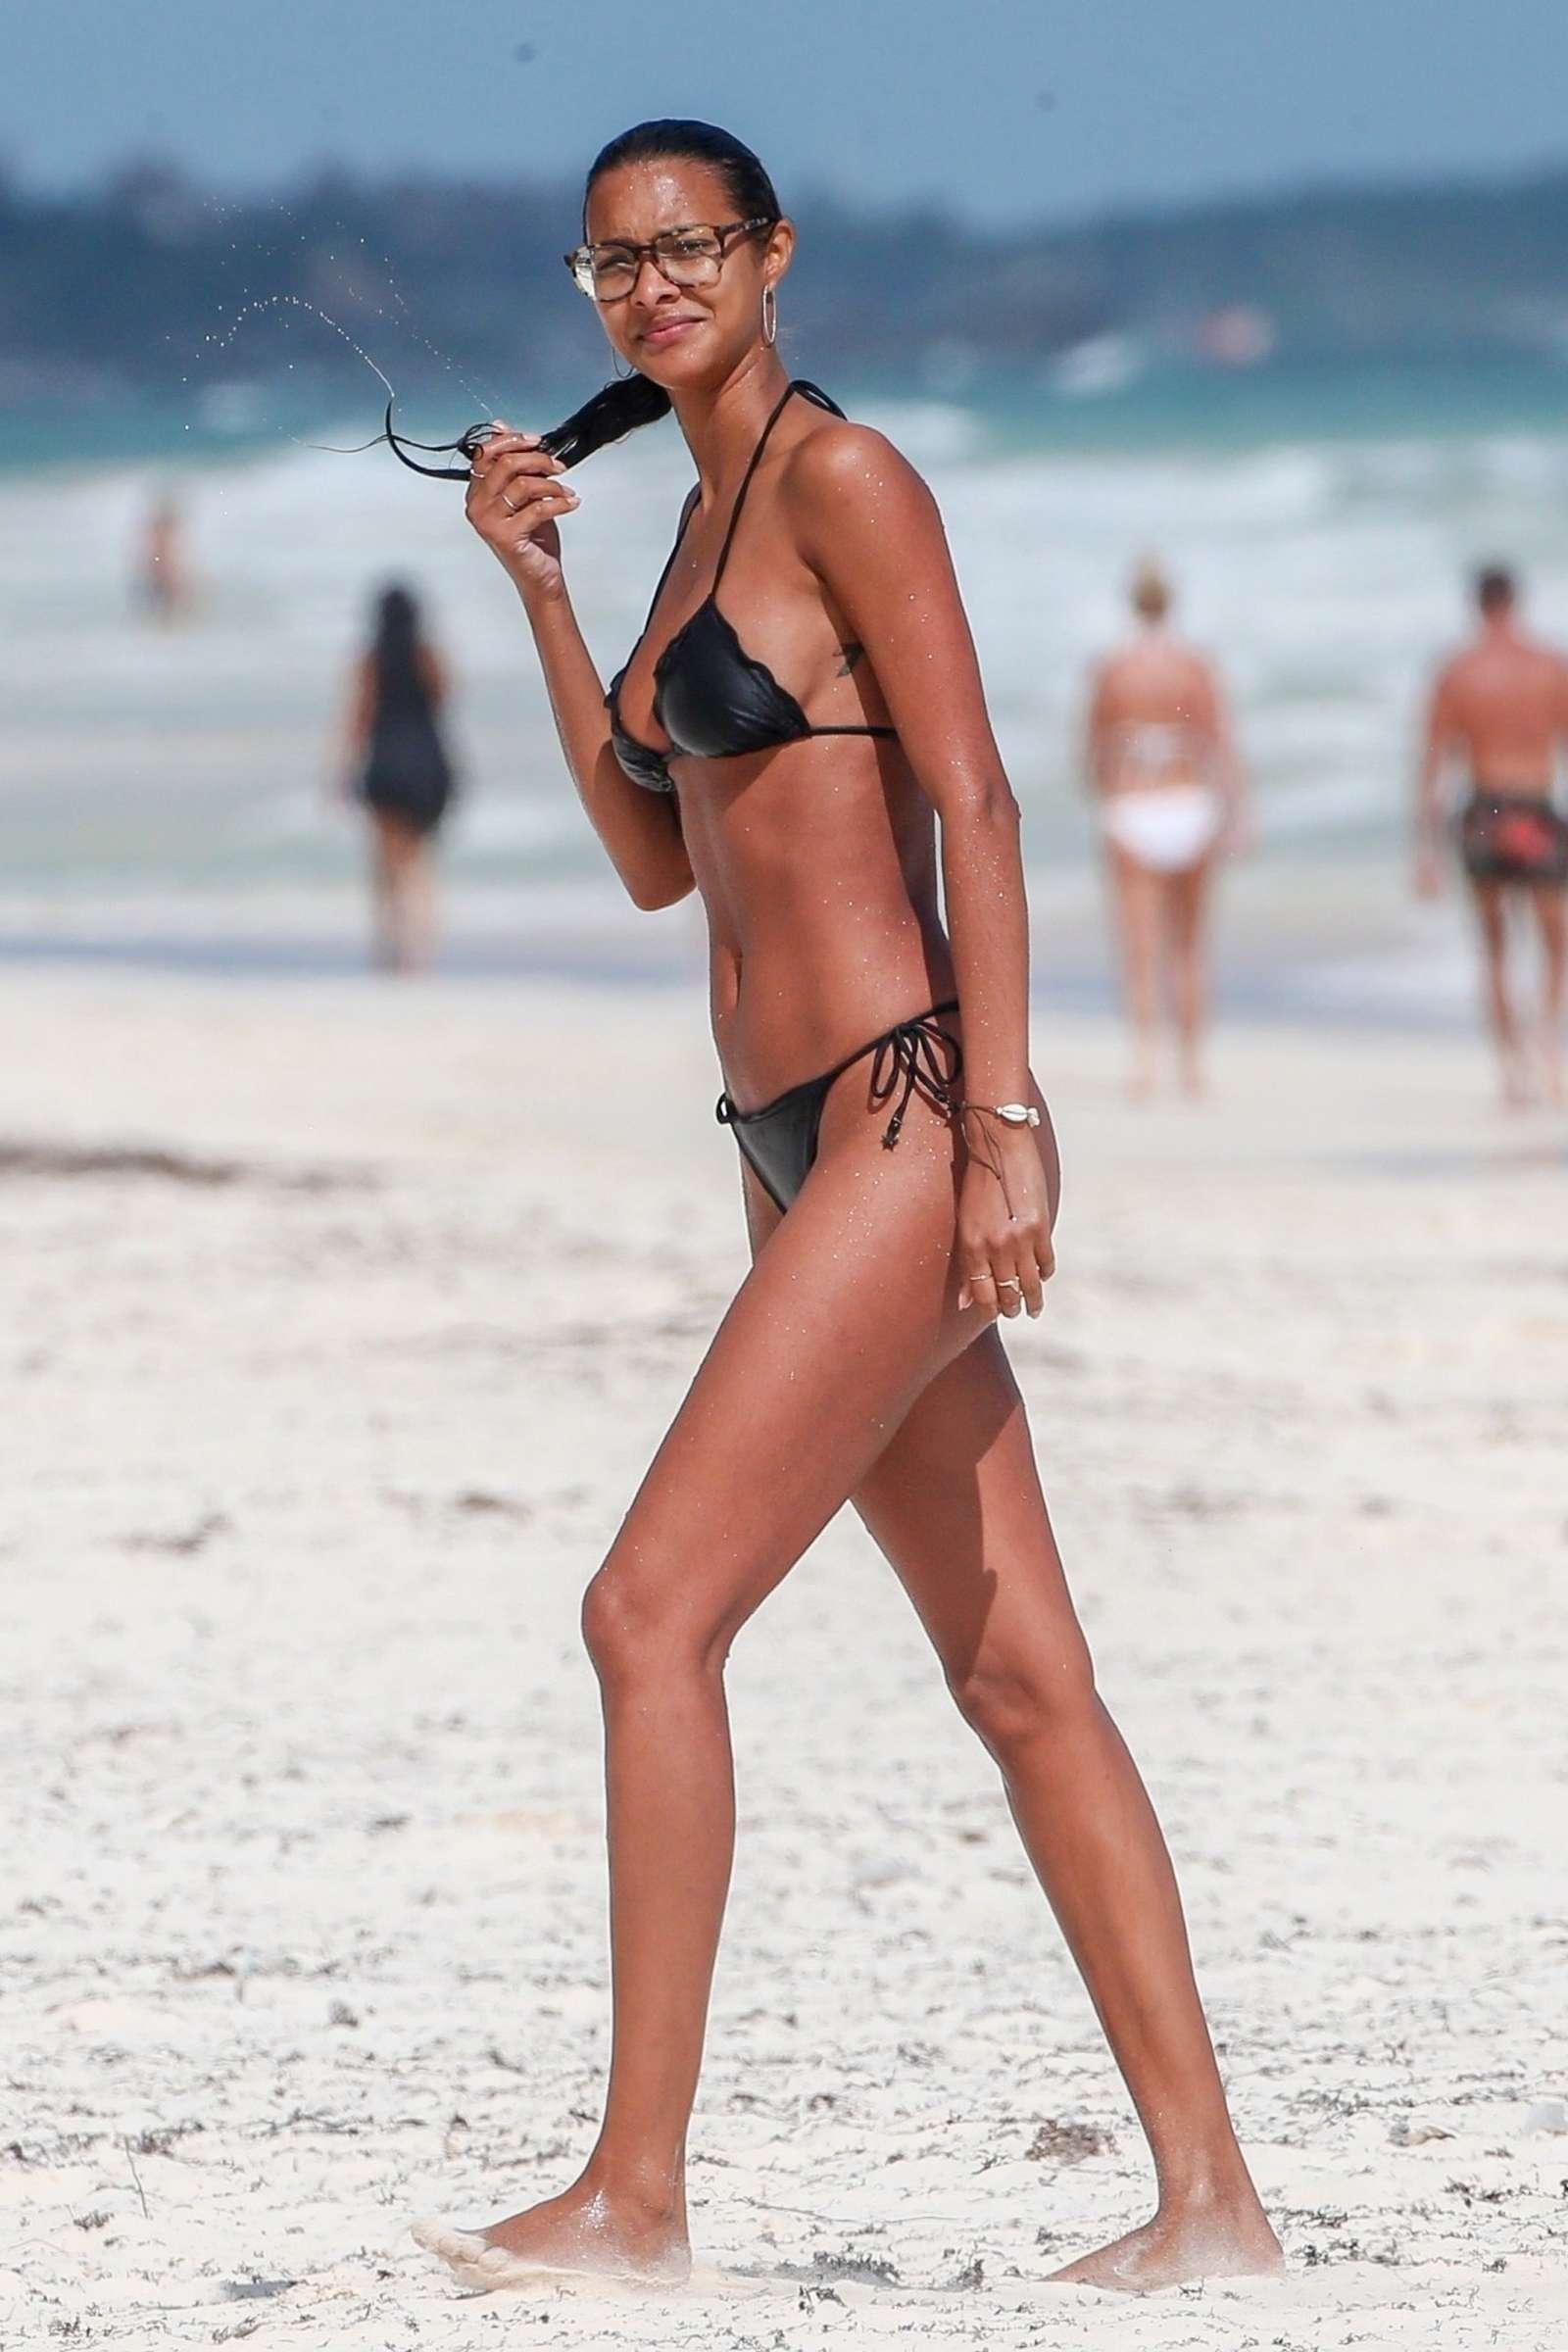 Lais Ribeiro in Black Bikini on the beach in Tulum